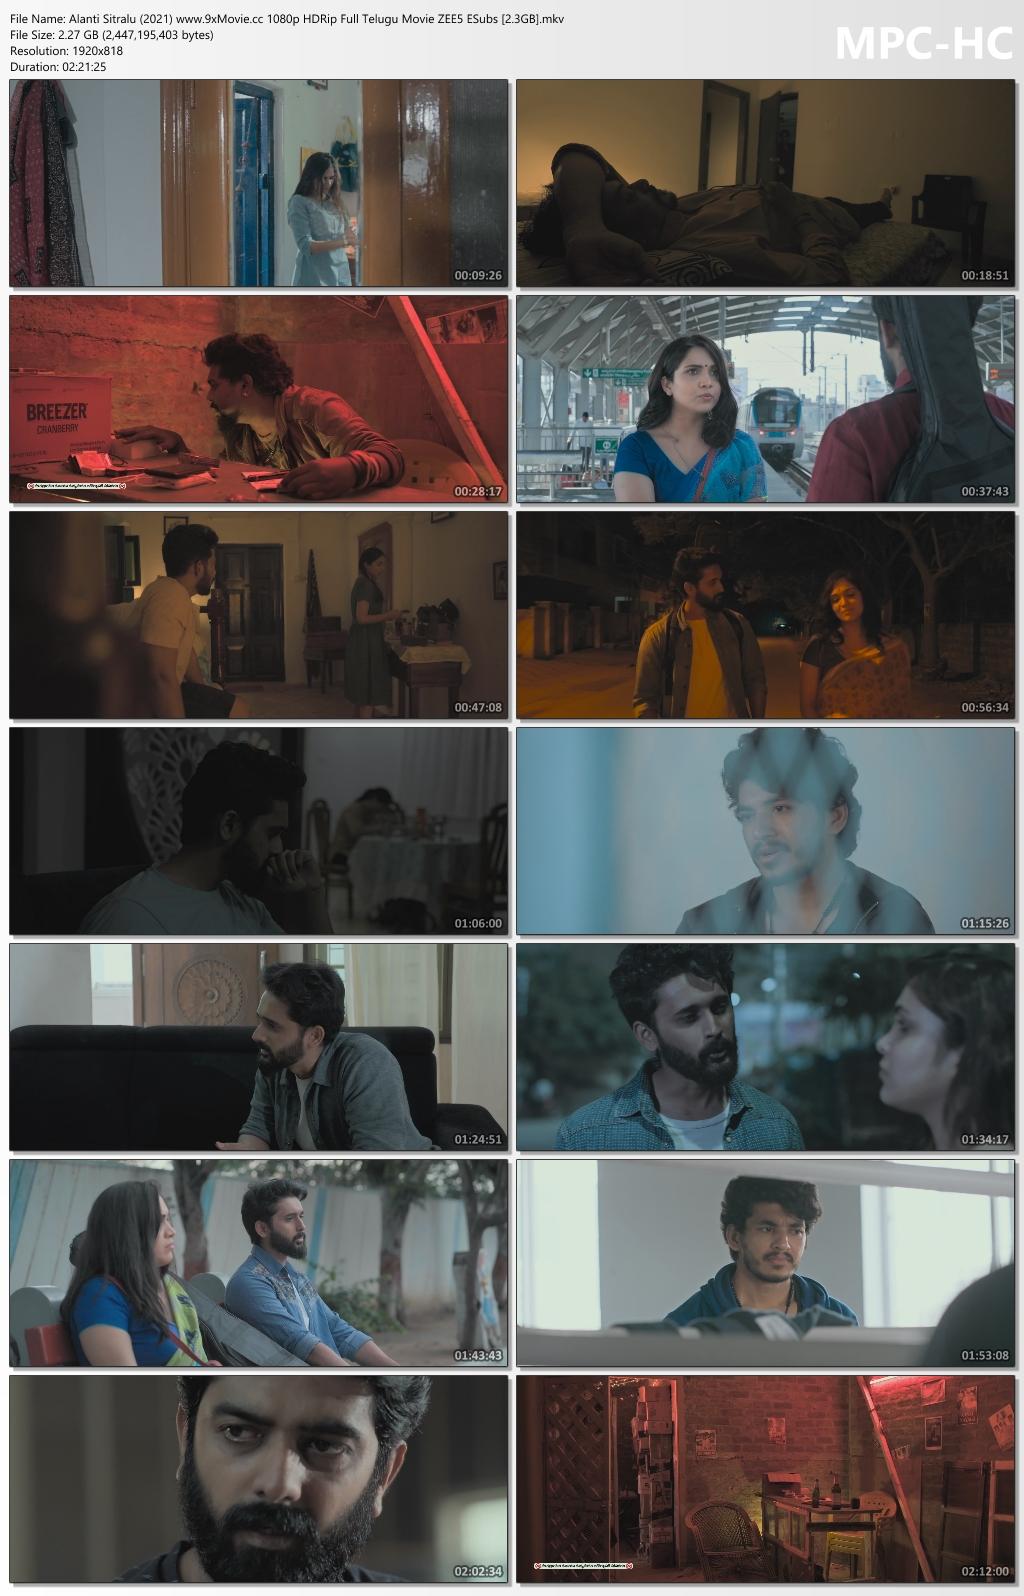 Alanti-Sitralu-2021-www-9x-Movie-cc-1080p-HDRip-Full-Telugu-Movie-ZEE5-ESubs-2-3-GB-mkv